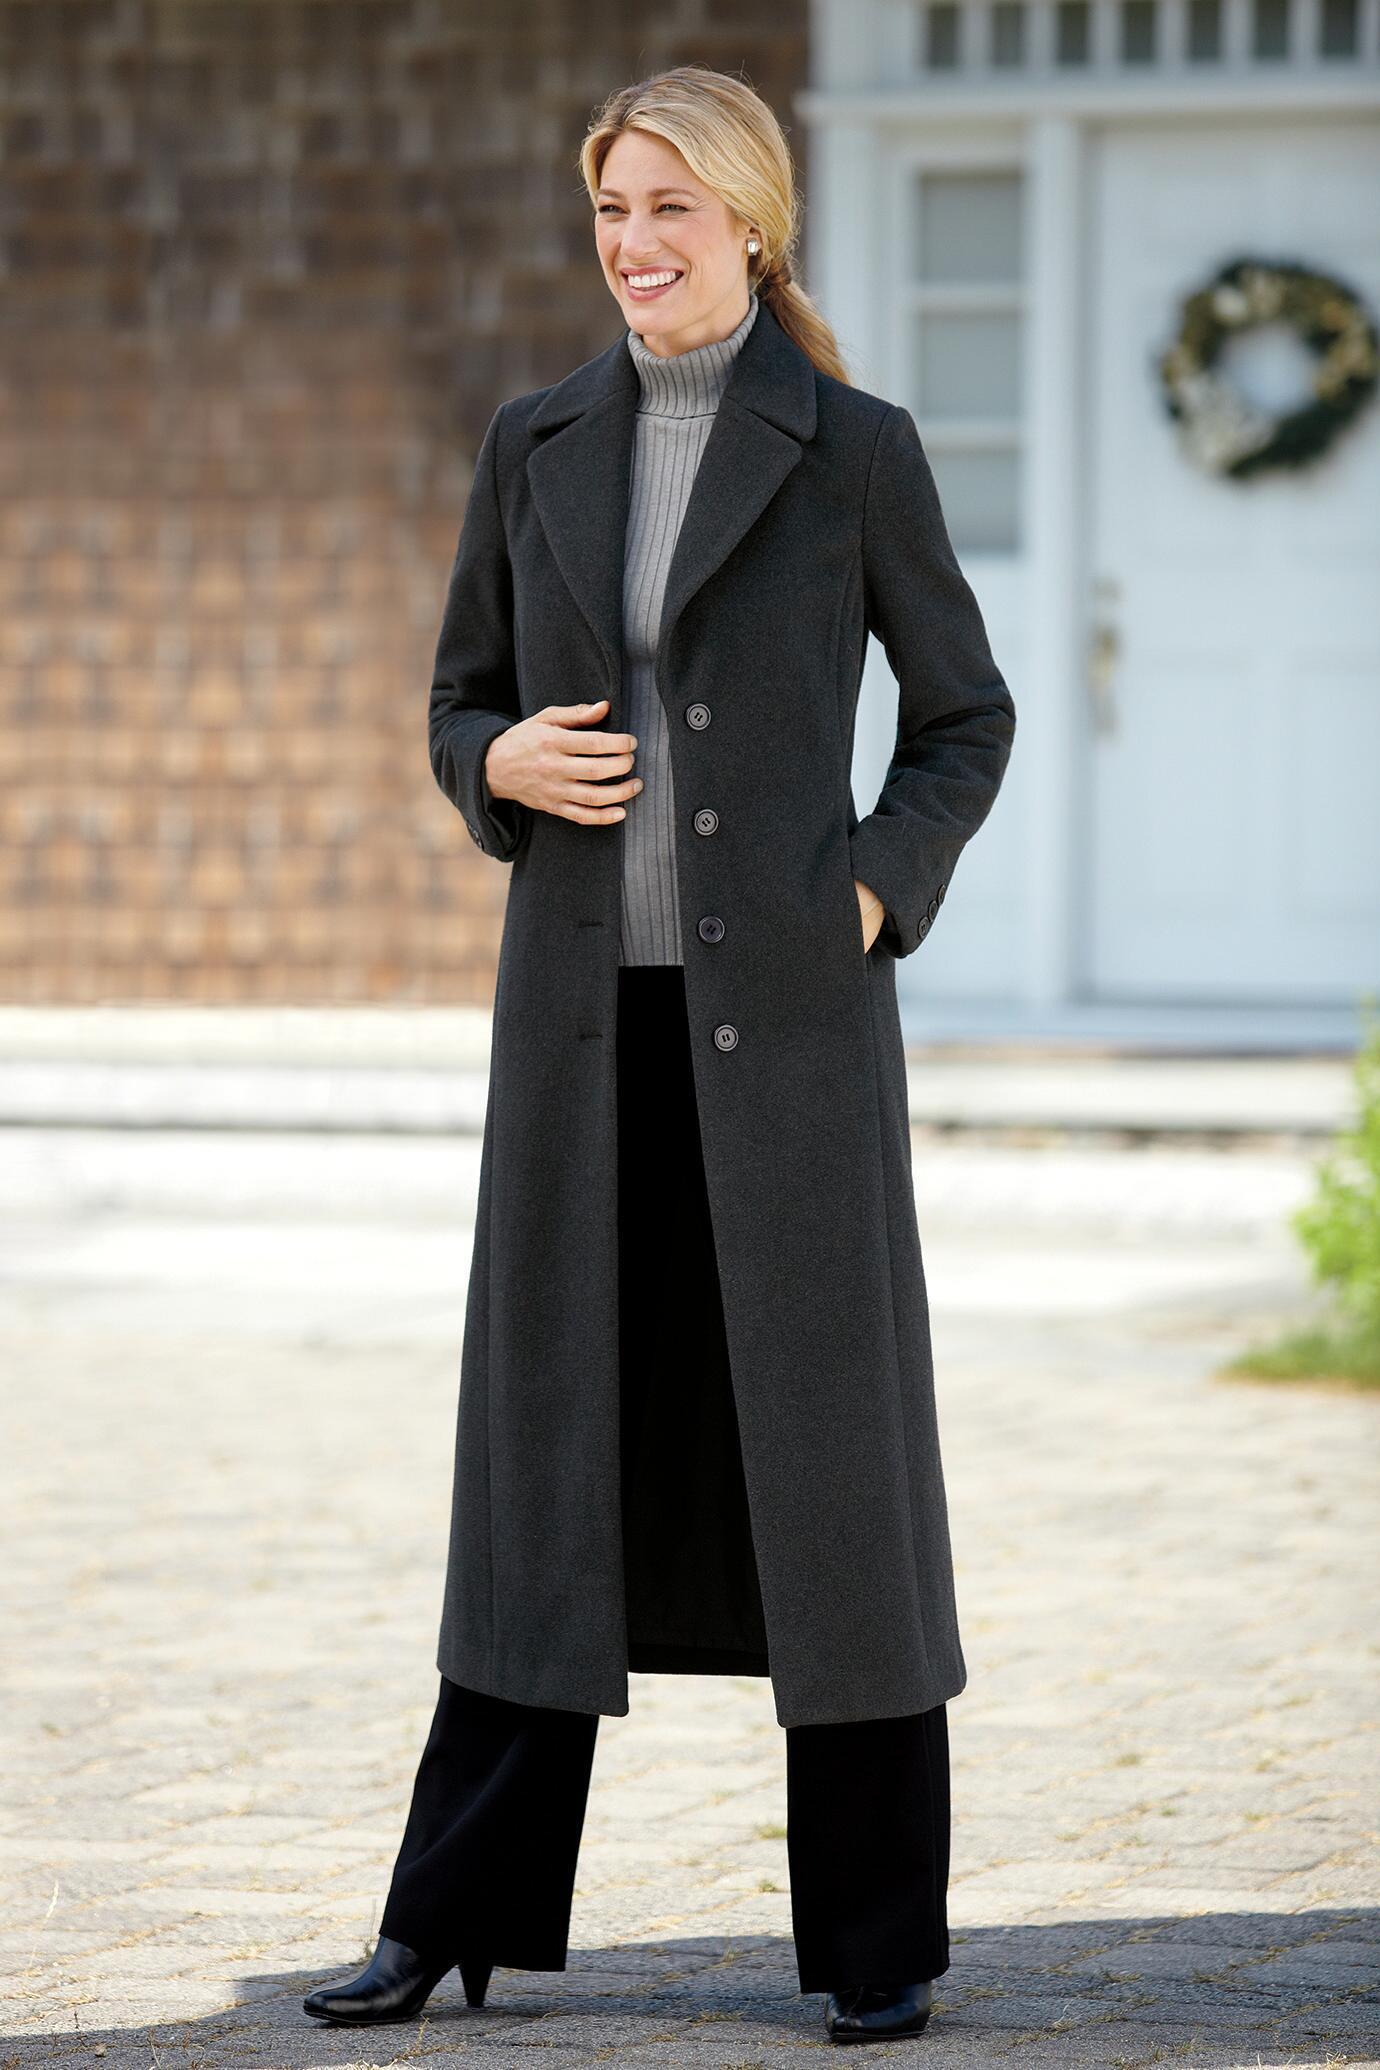 Long Wool Coat The Best Ways To Wear One Careyfashion Com